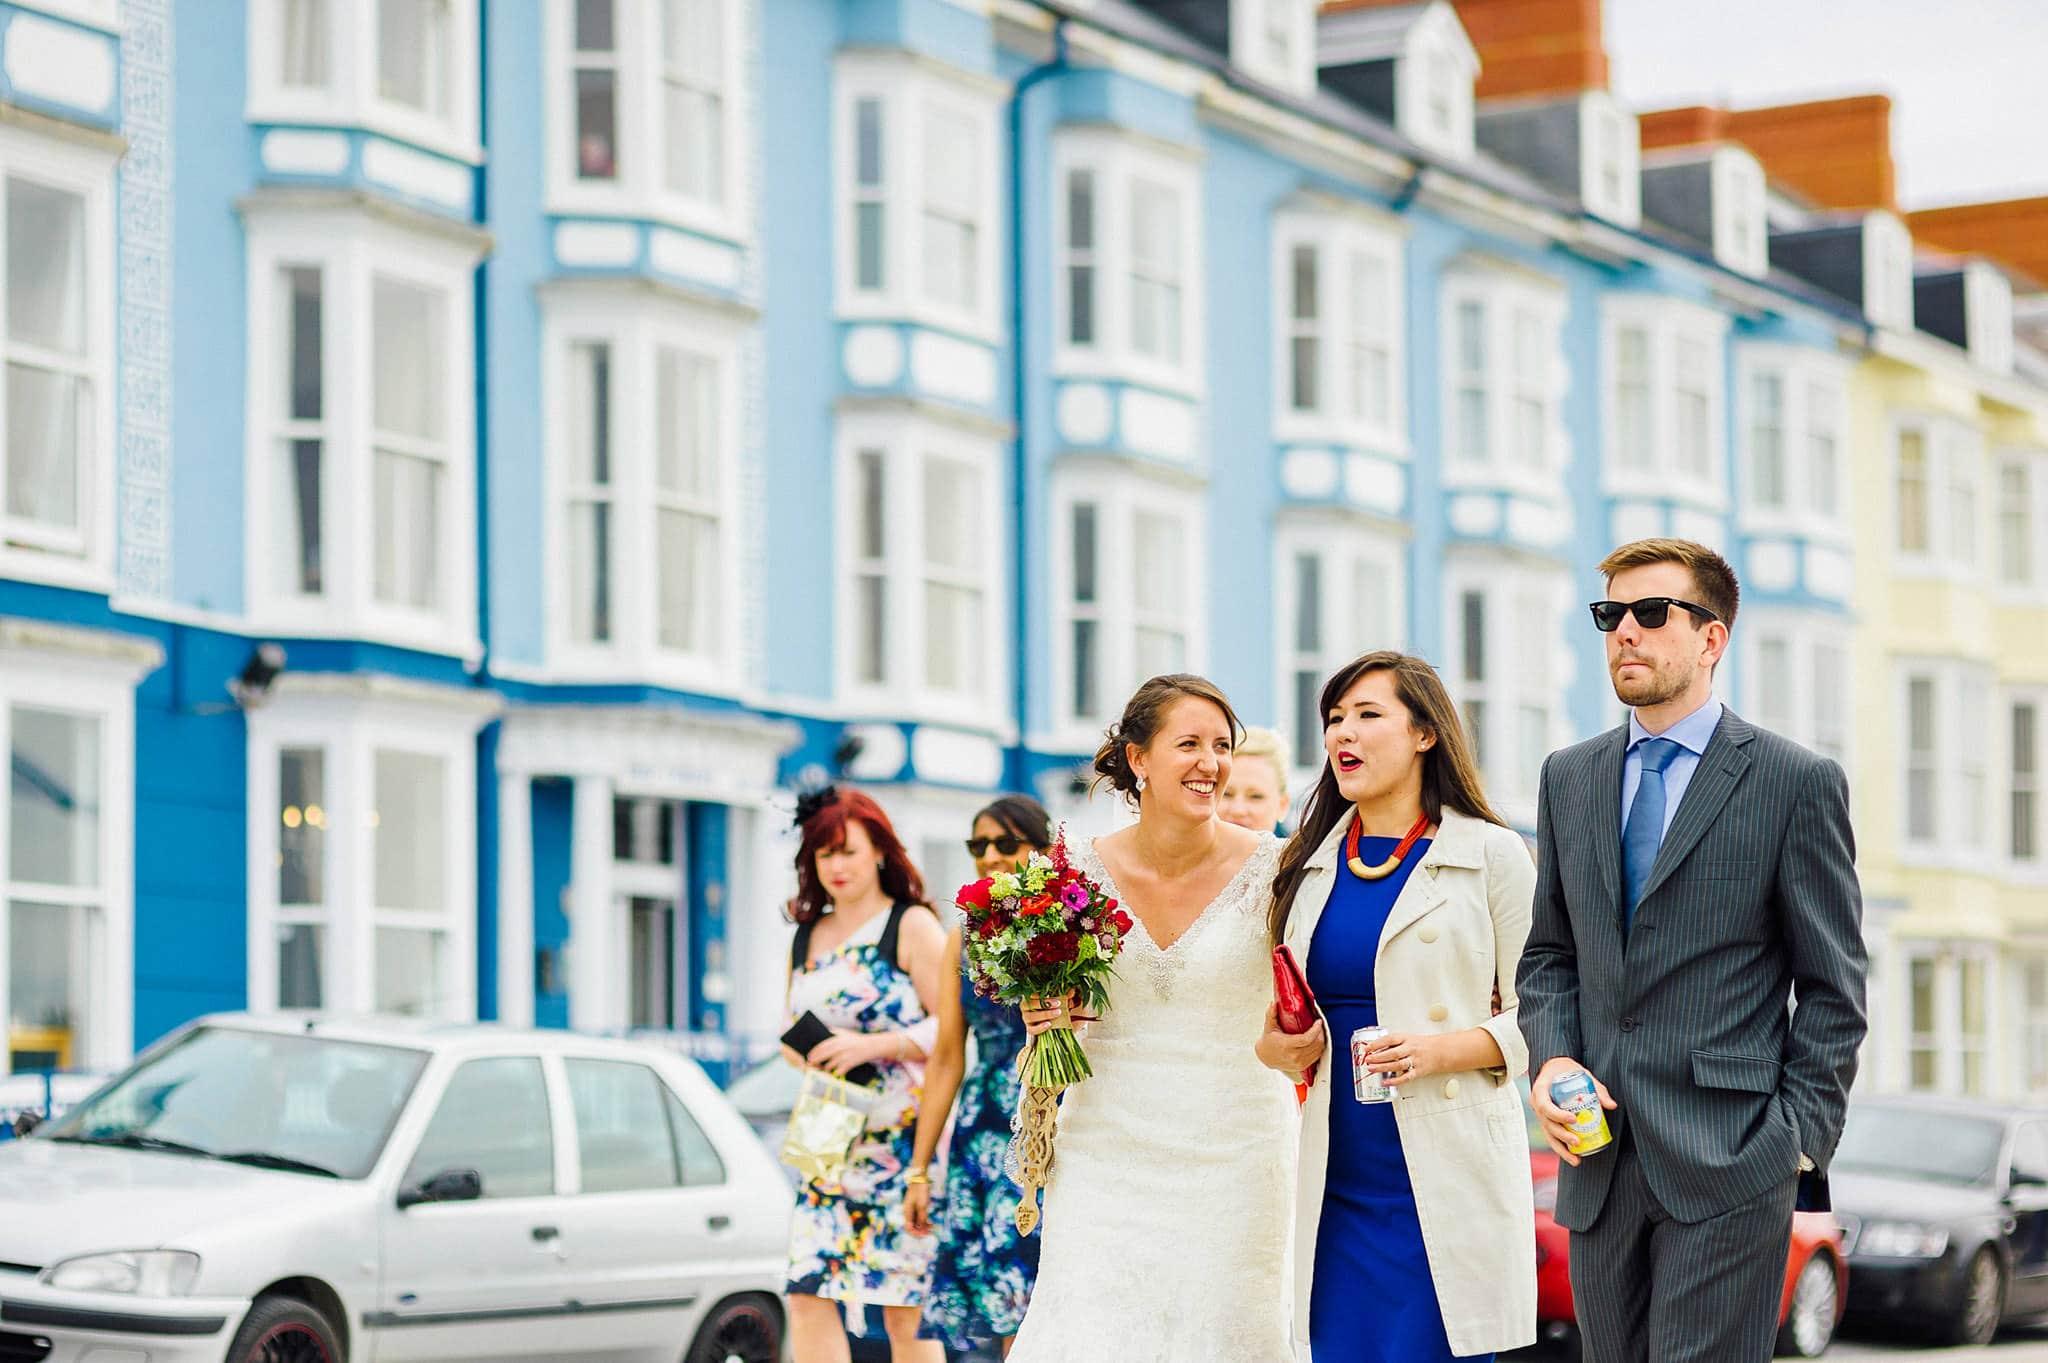 wedding-photographer-aberystwyth-wales (104)